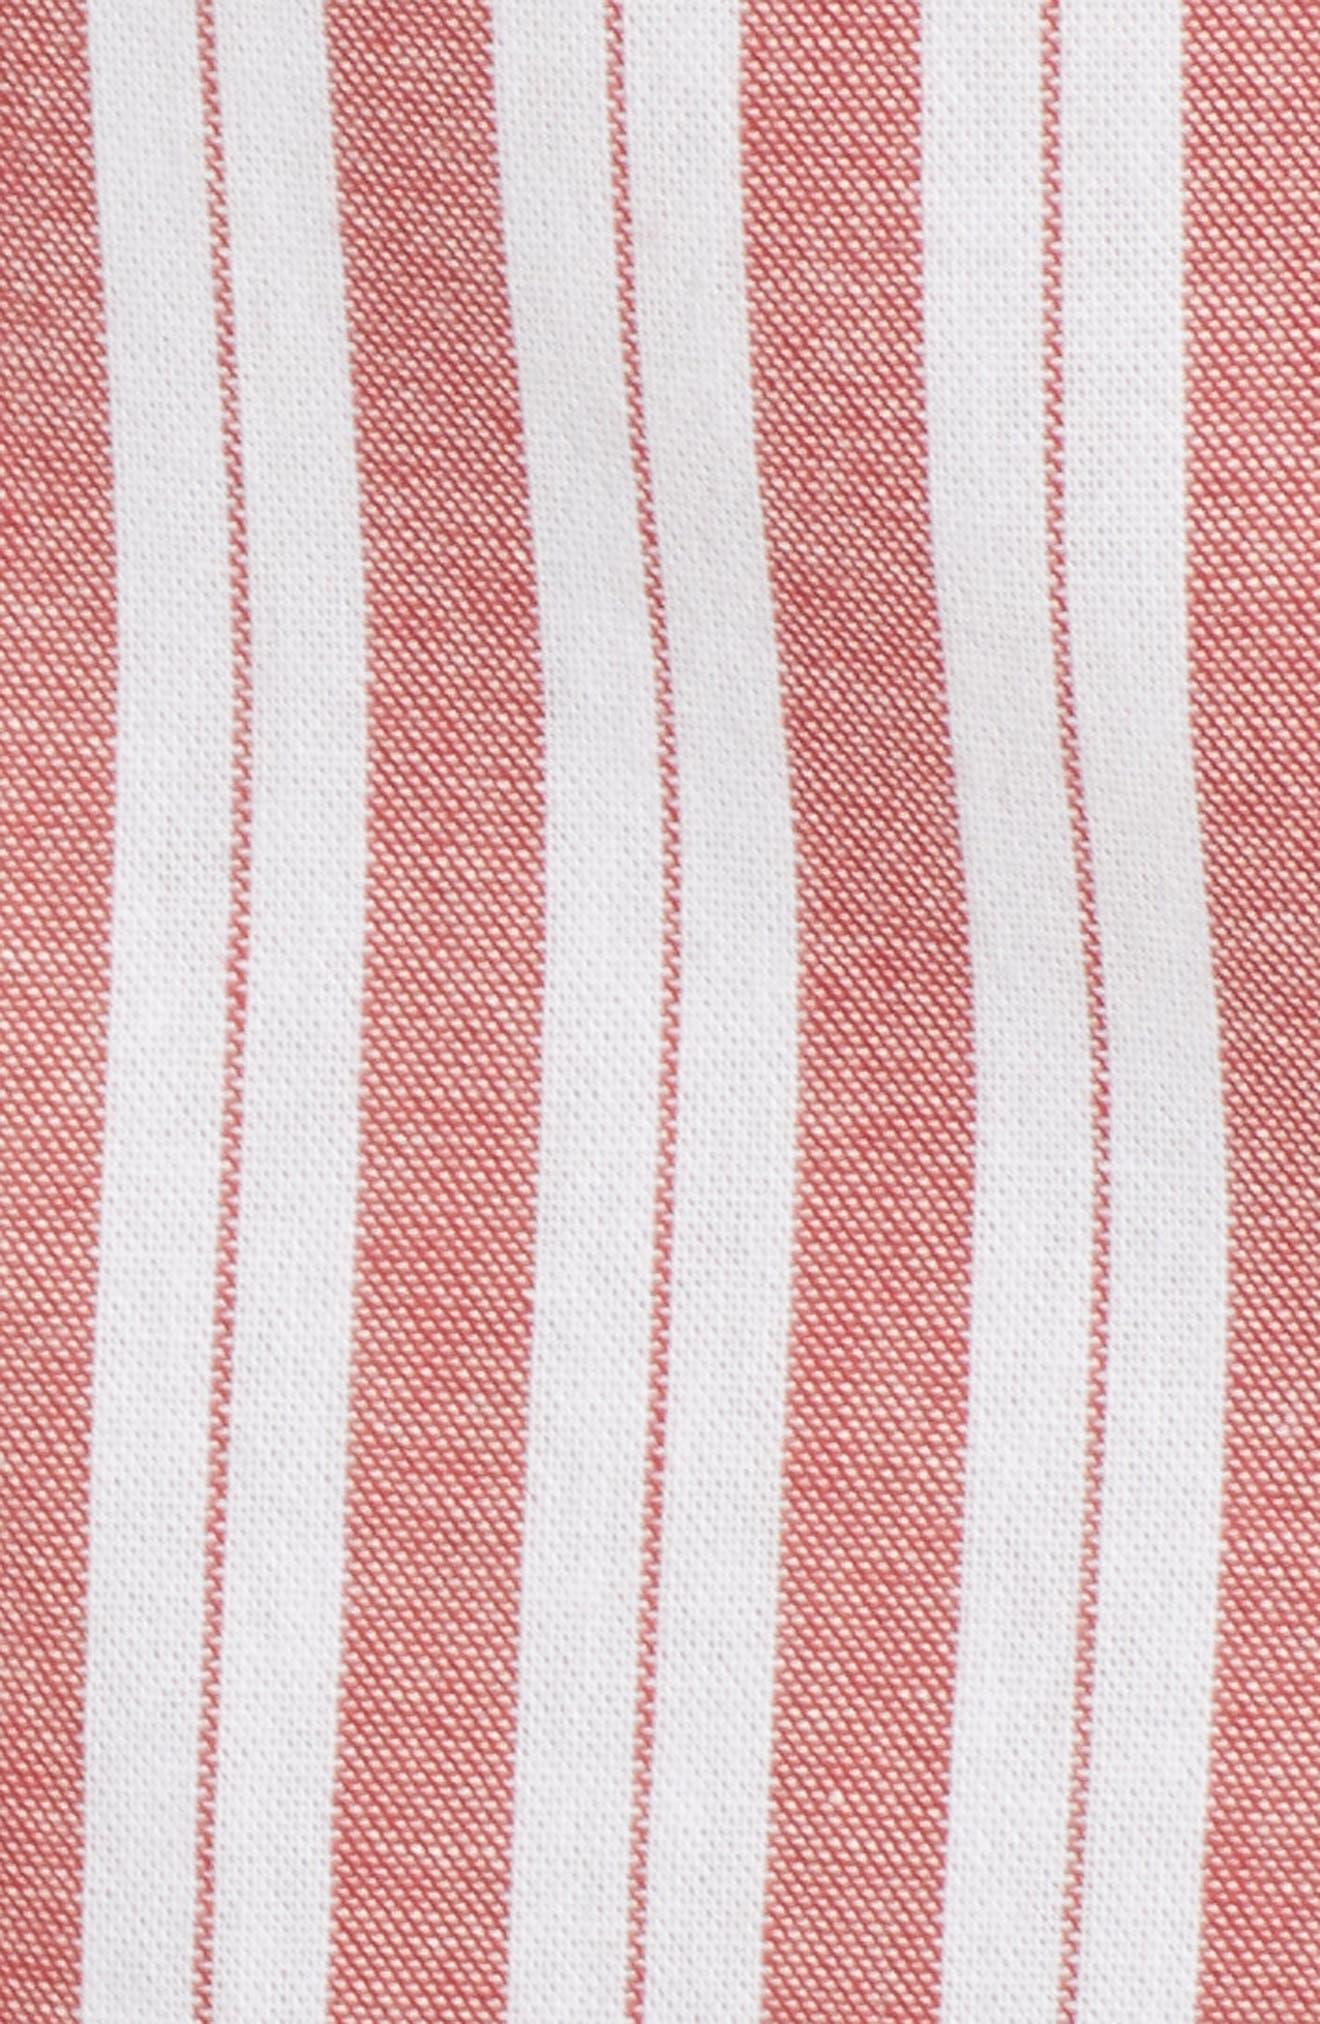 Acacia Stripe Ruffle Dress,                             Alternate thumbnail 7, color,                             White W Red